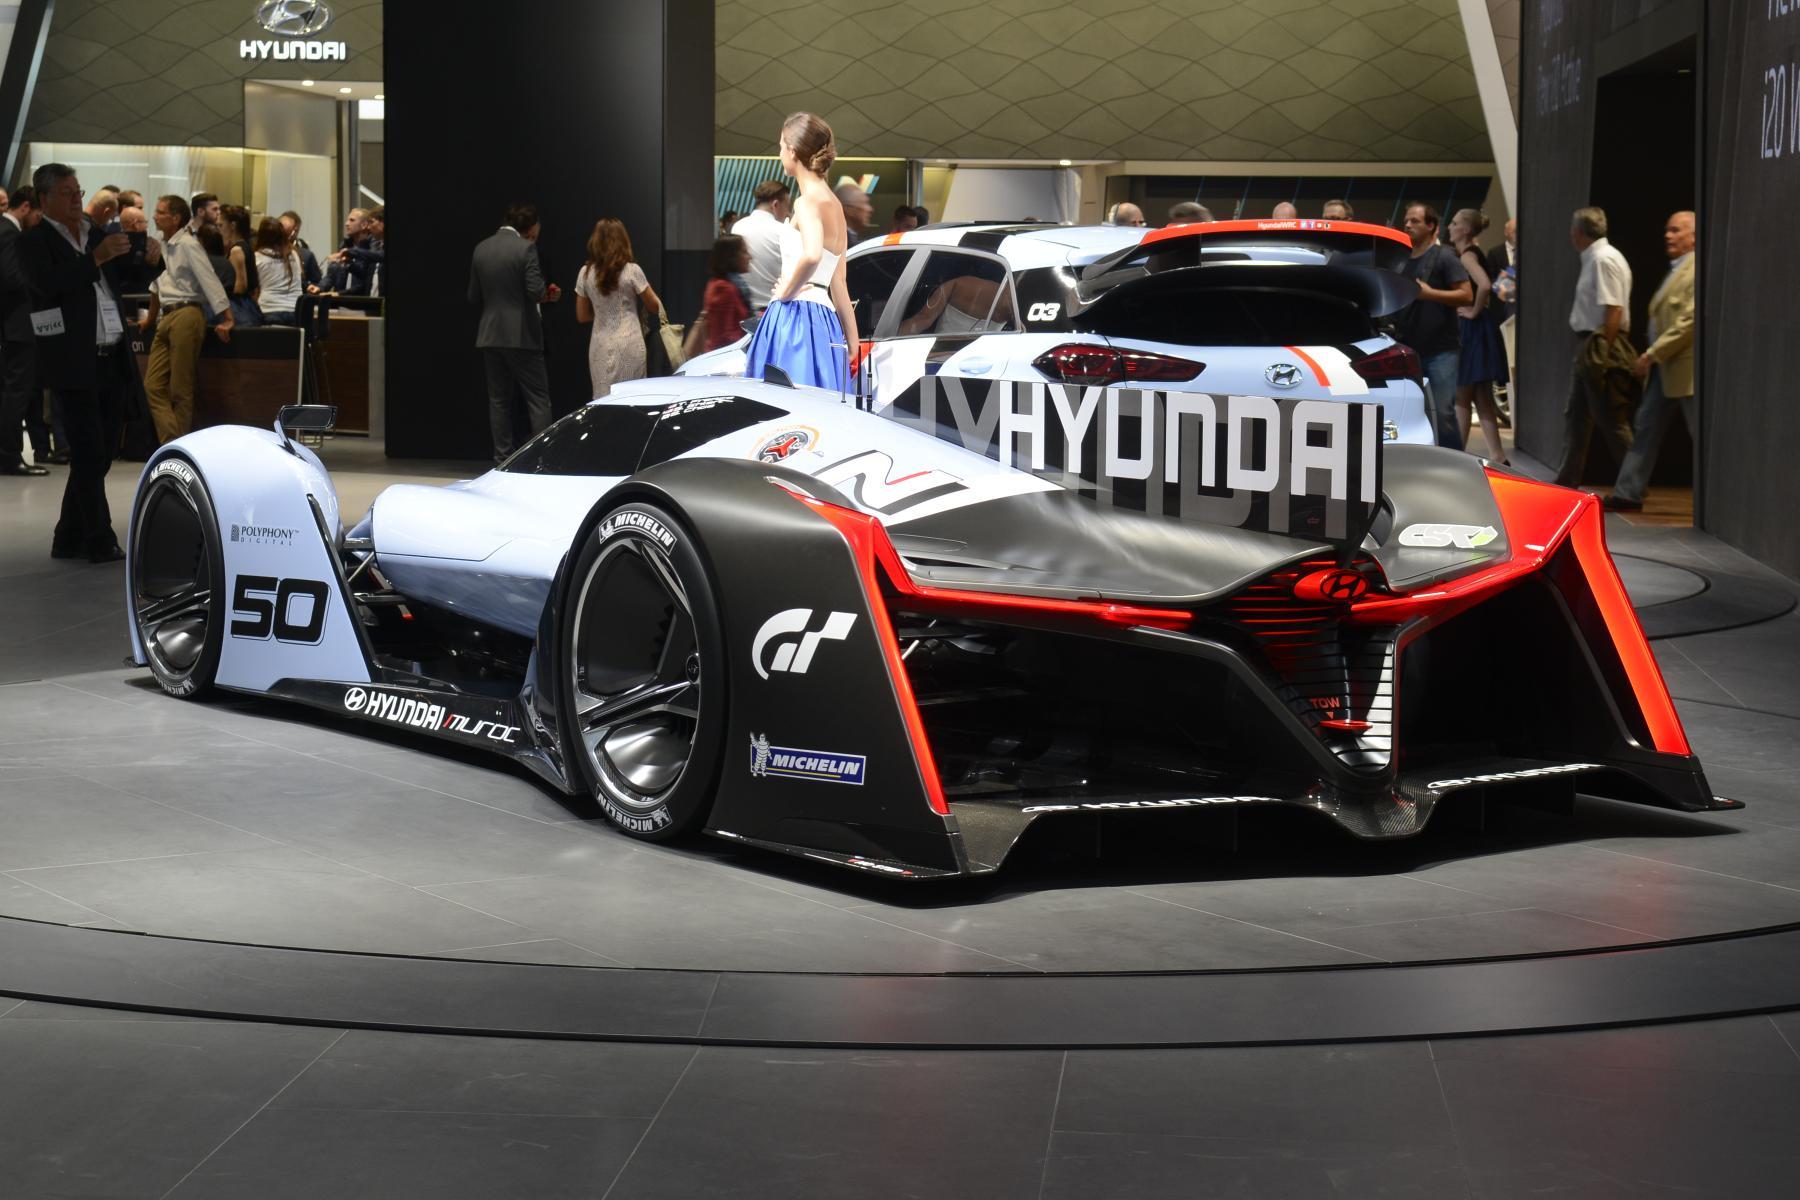 Hyundai N 2025 Vision Gran Turismo (rear)